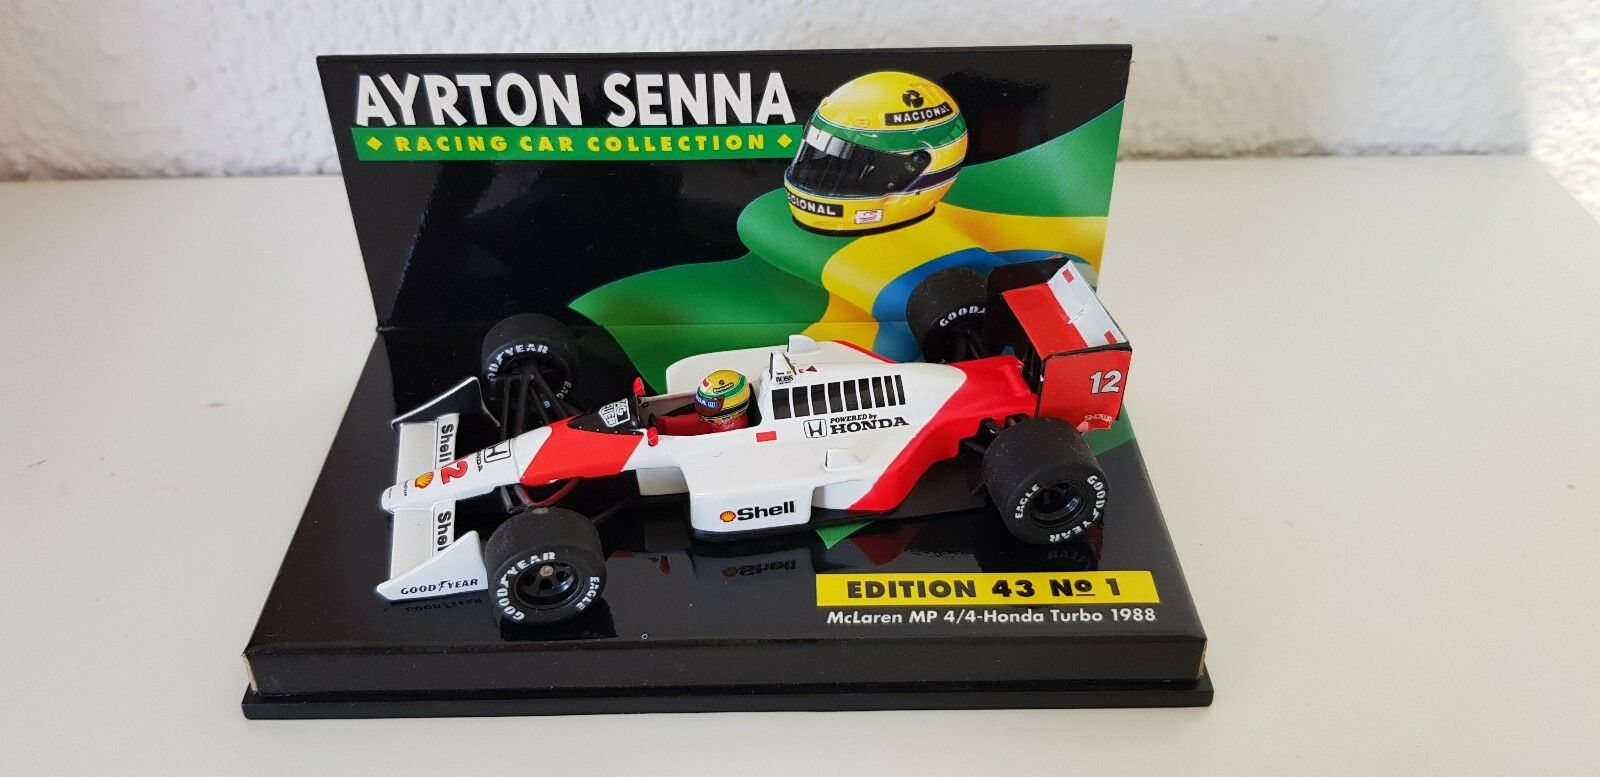 Minichamps 1:43 A. Senna COLLECTION nr 01 McLaren MP 4/4 World Champion 1988